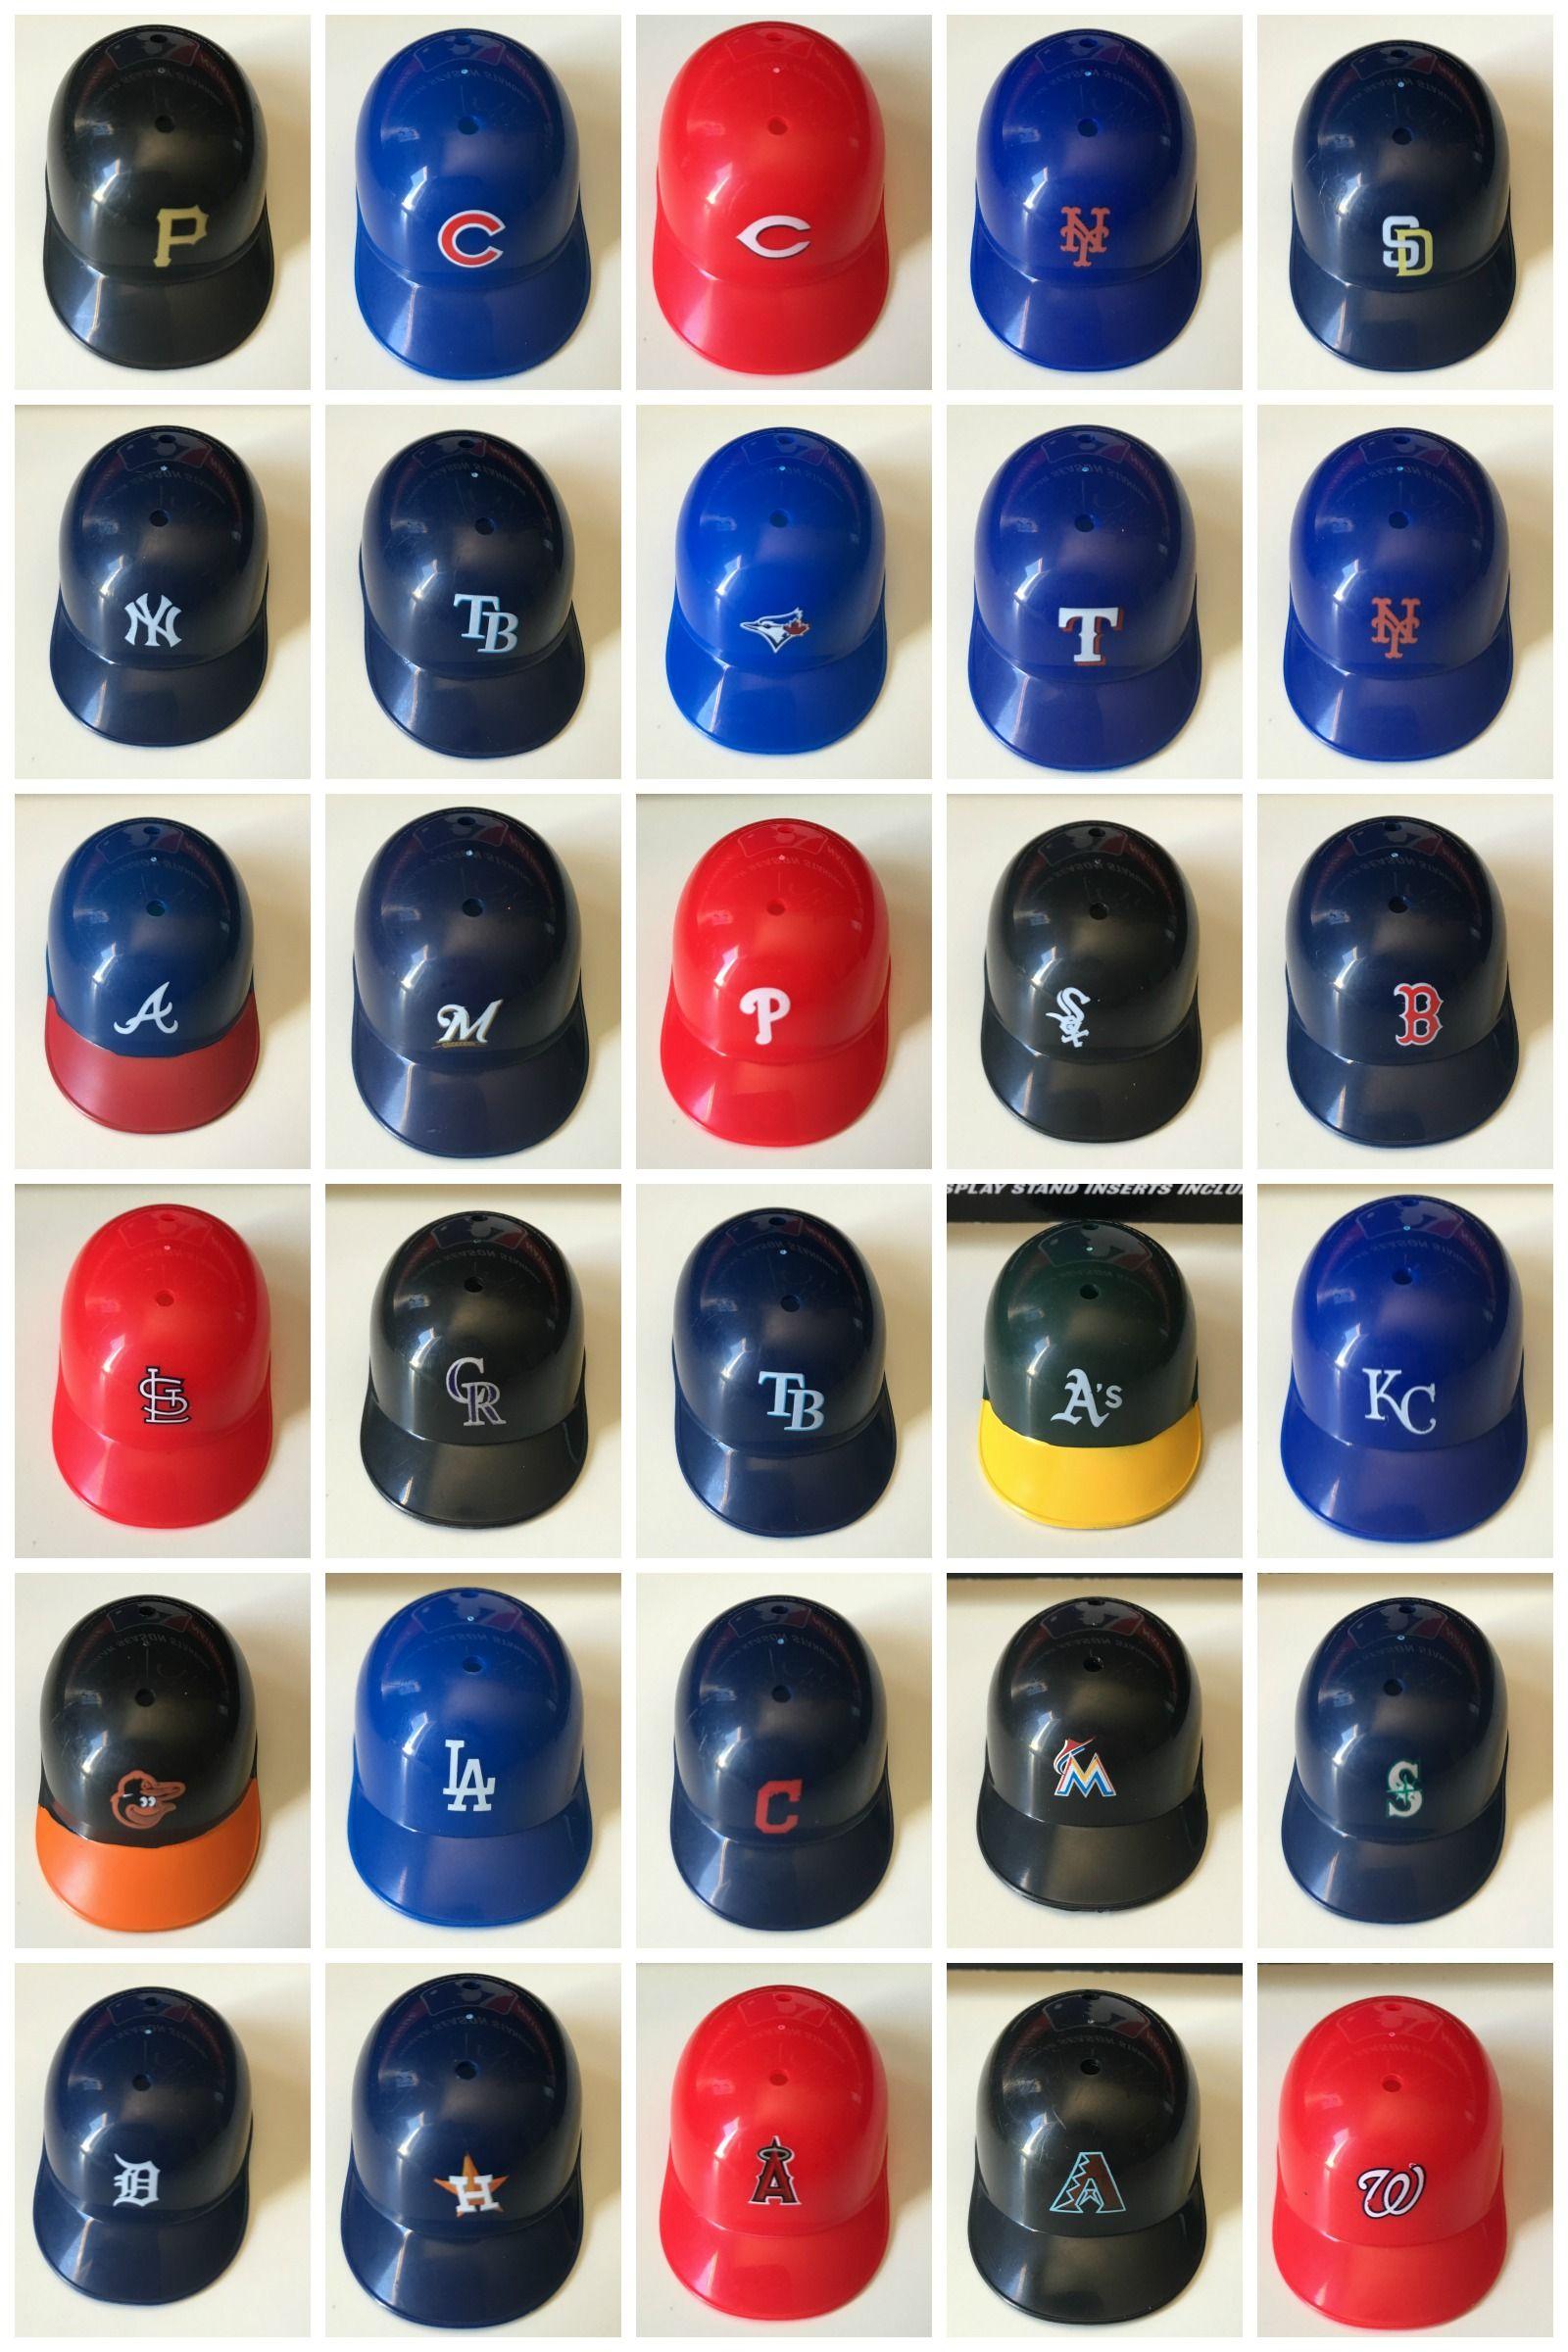 30 Mini Baseball Helmets To Track The Mlb Standings Includes Stand Baseball Helmet Youth Baseball Gloves Mlb Standings